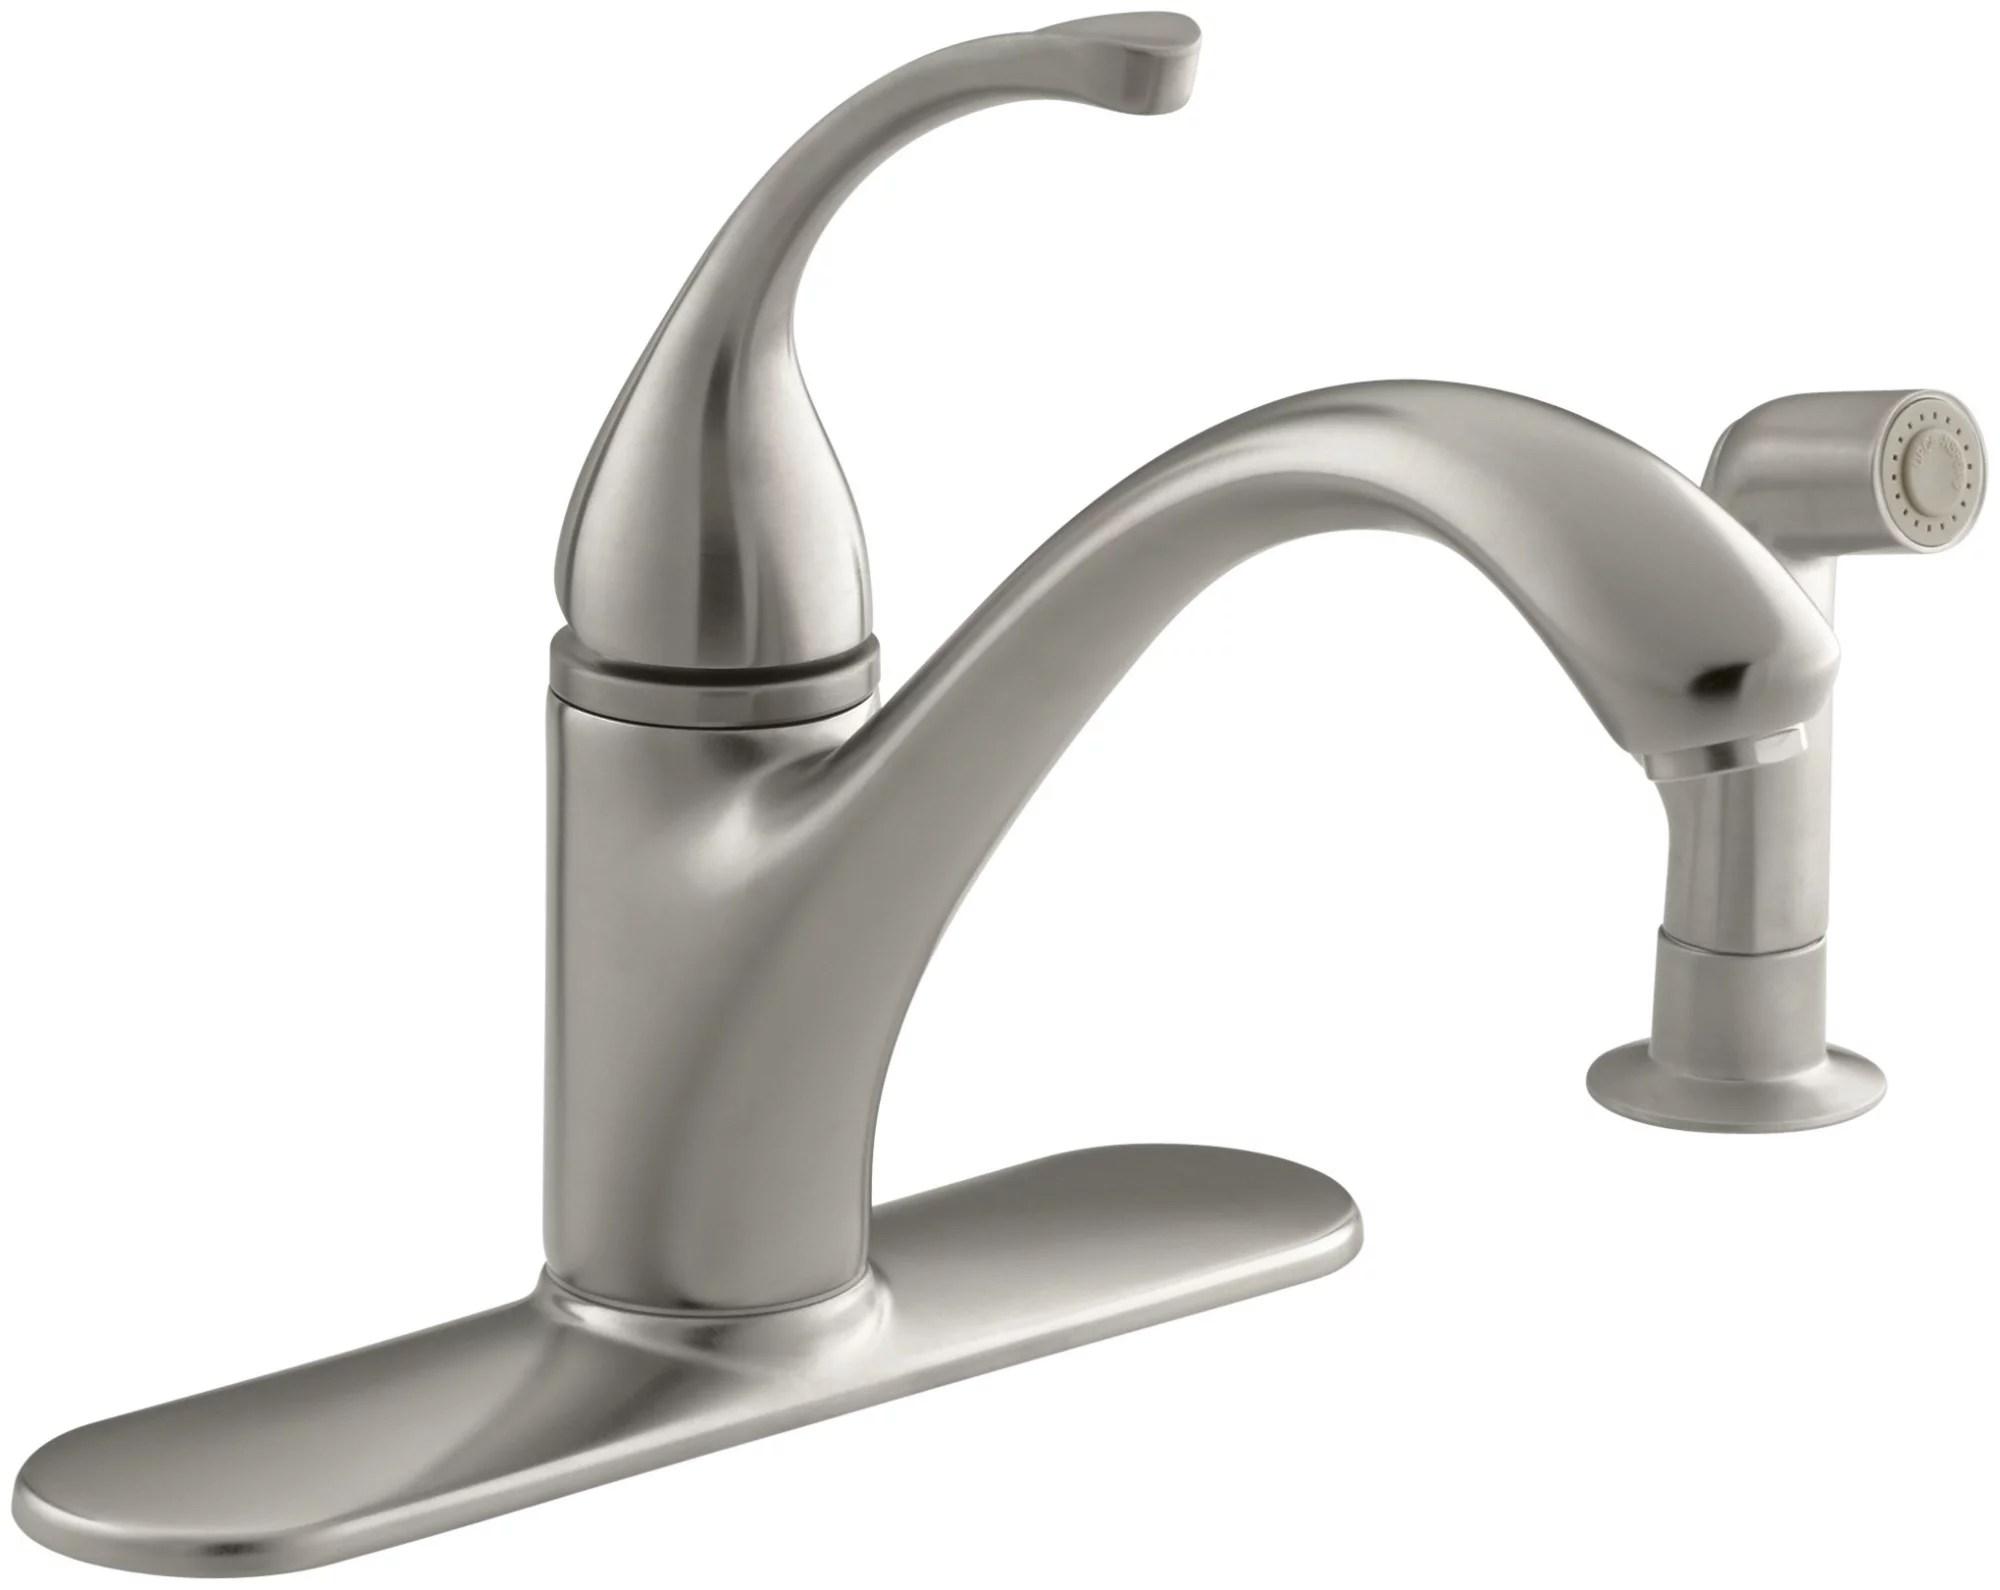 kohler k 10412 forte single handle kitchen faucet